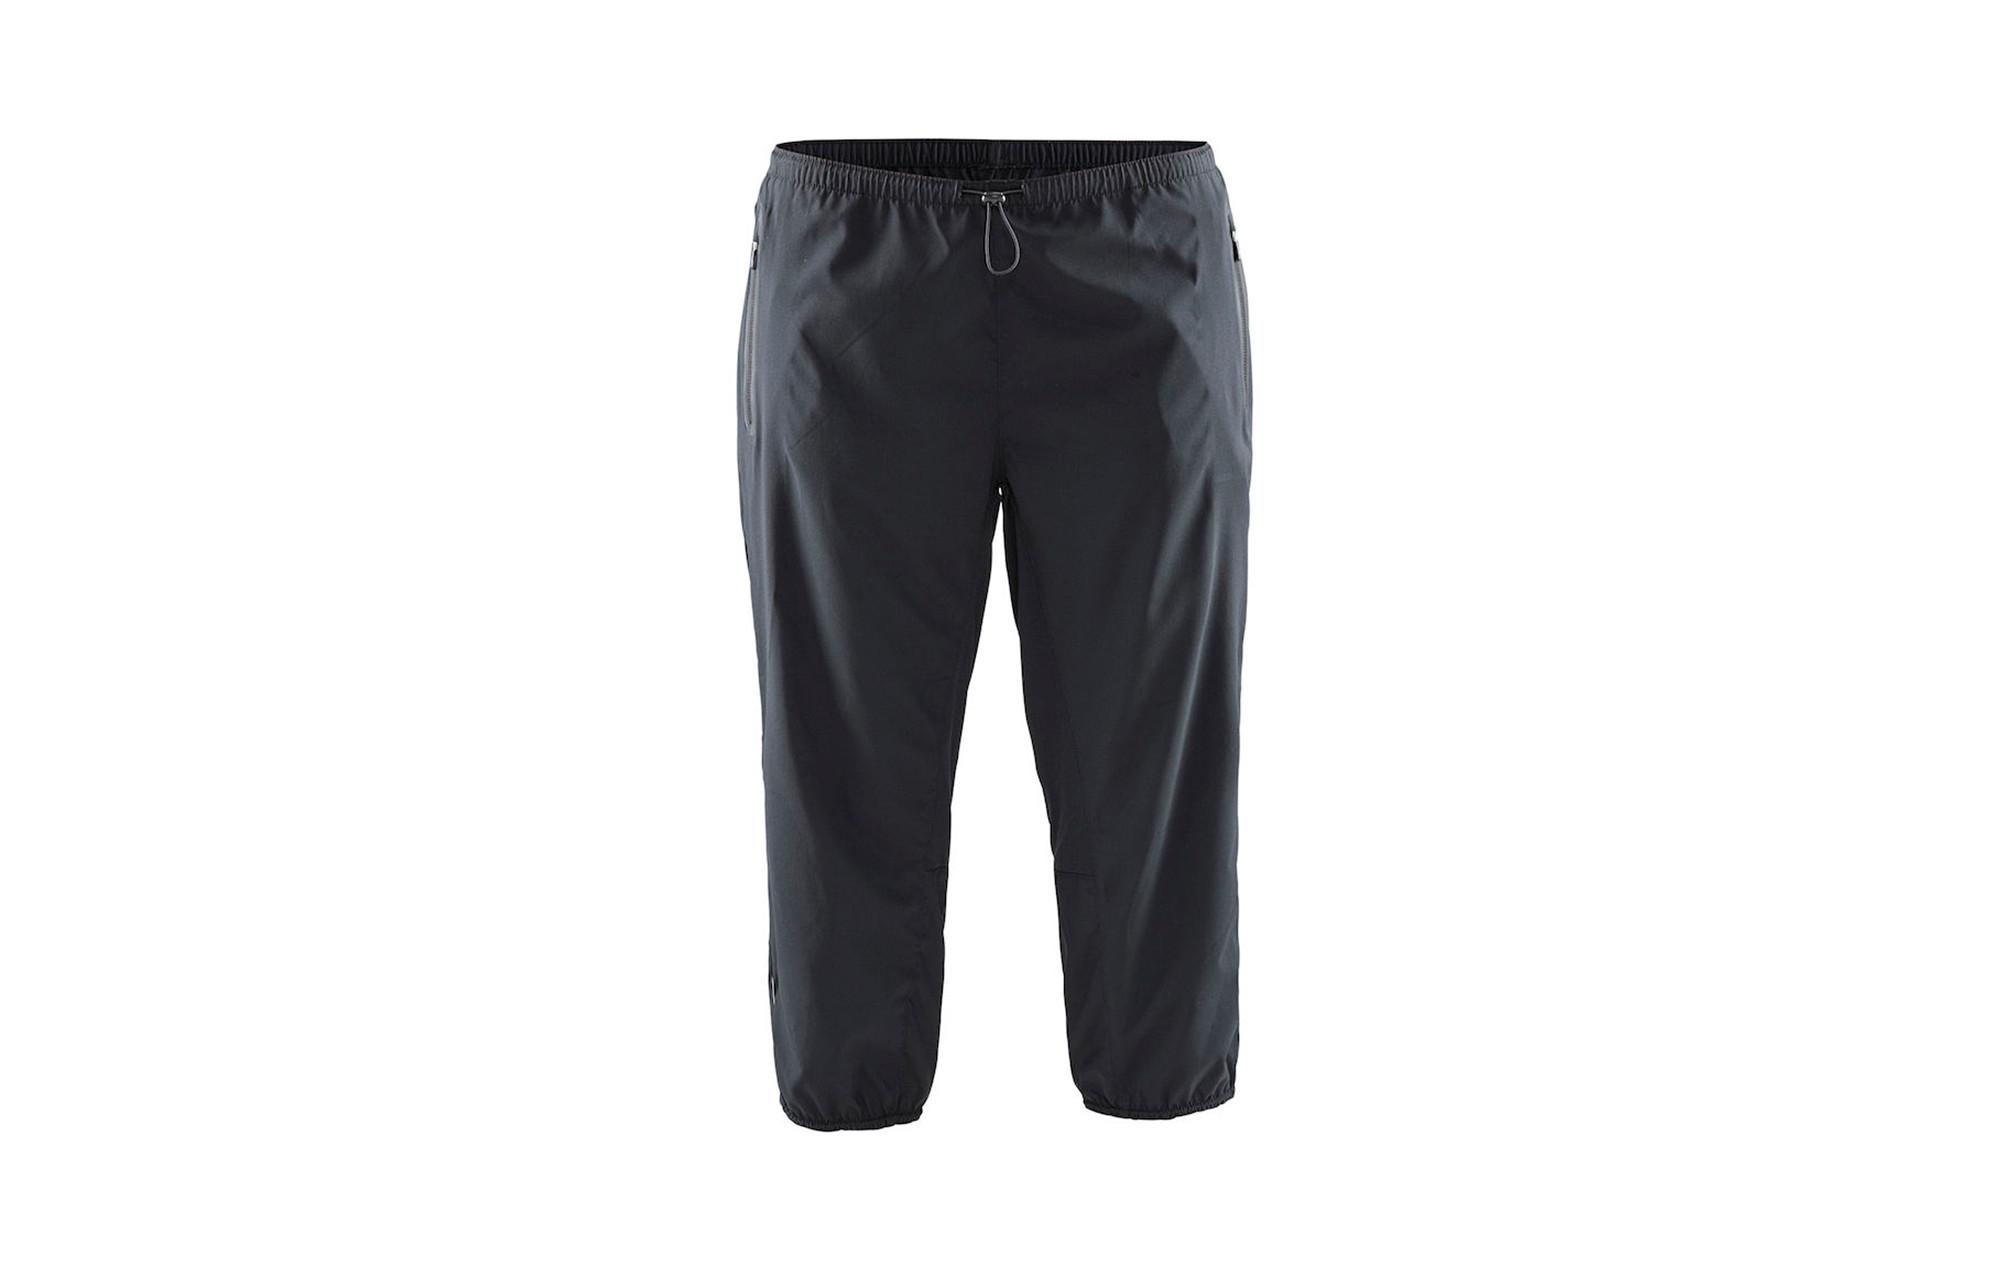 27e7a840 Craft Trail Knickers Woments Pants - Black | Alltricks.com